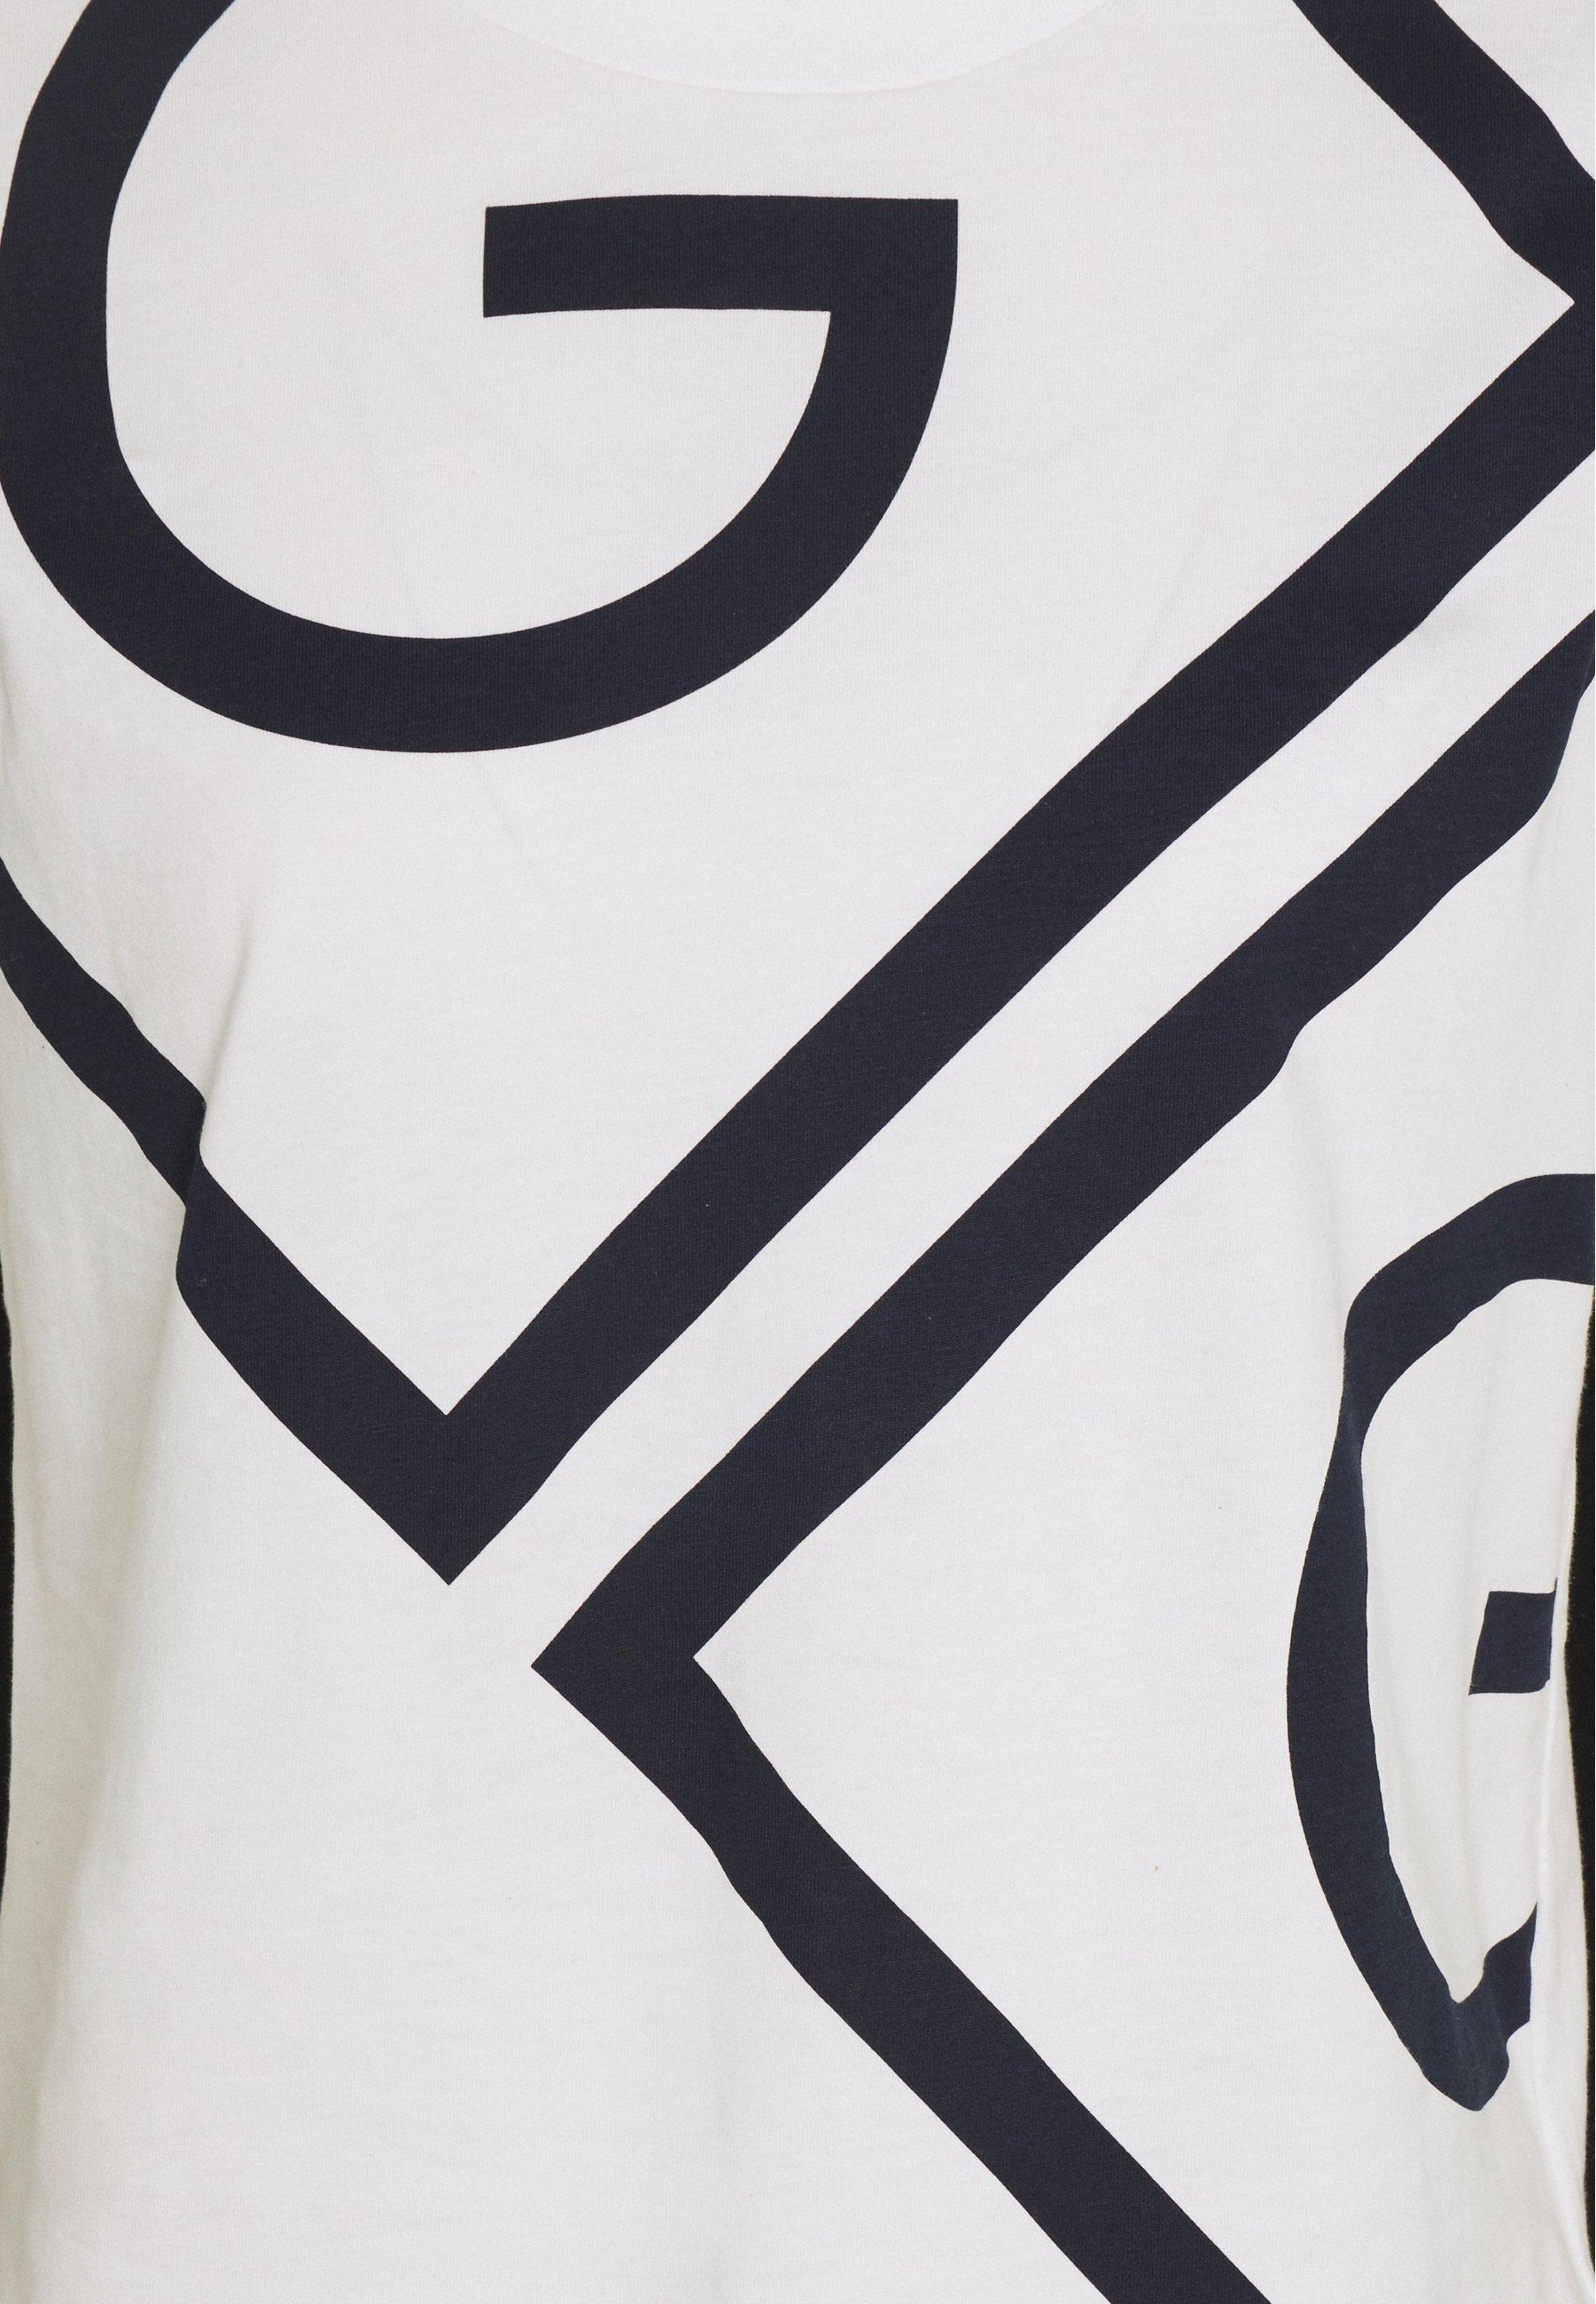 Official Women's Clothing GANT ICON  Print T-shirt eggshell zo1tifBjT